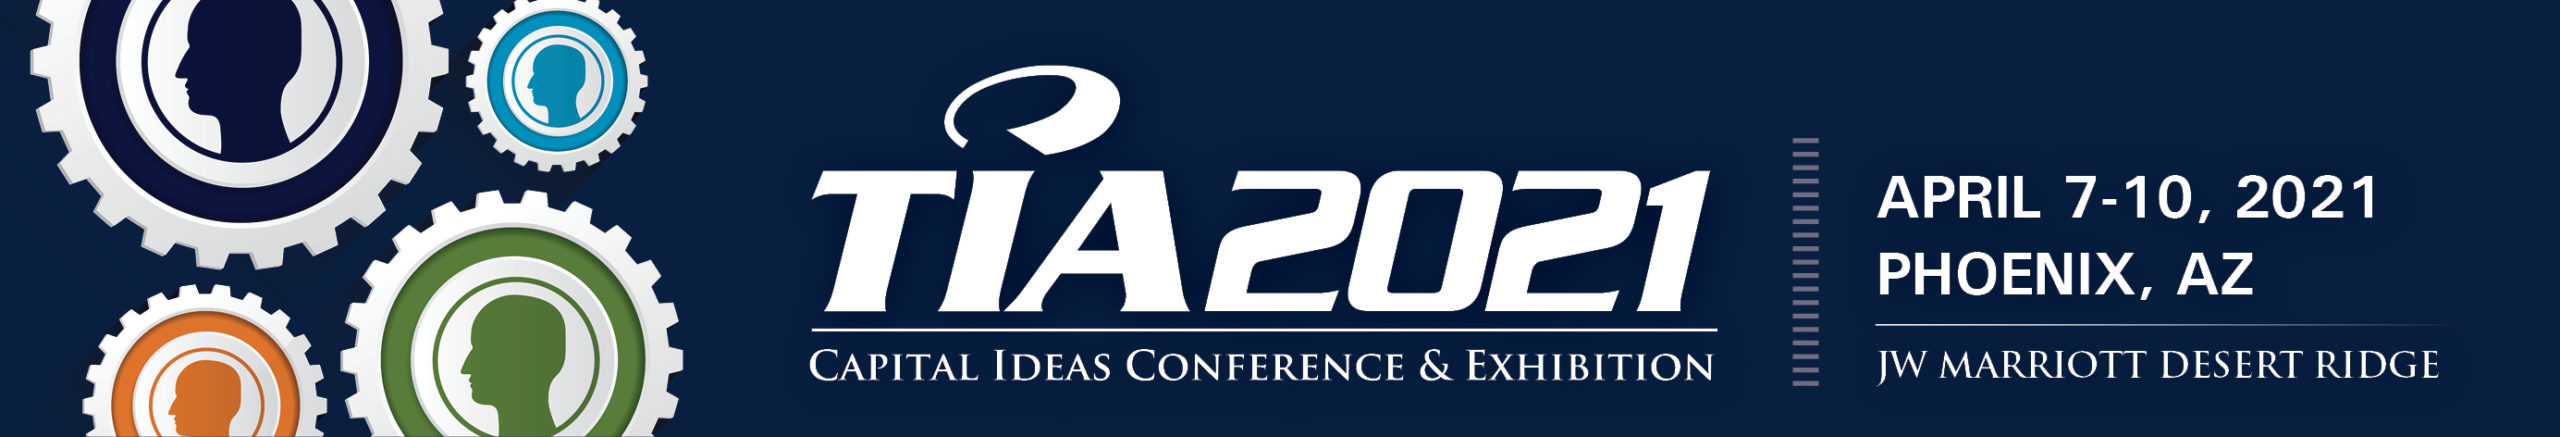 2021 Conference Design (TIA Blue)